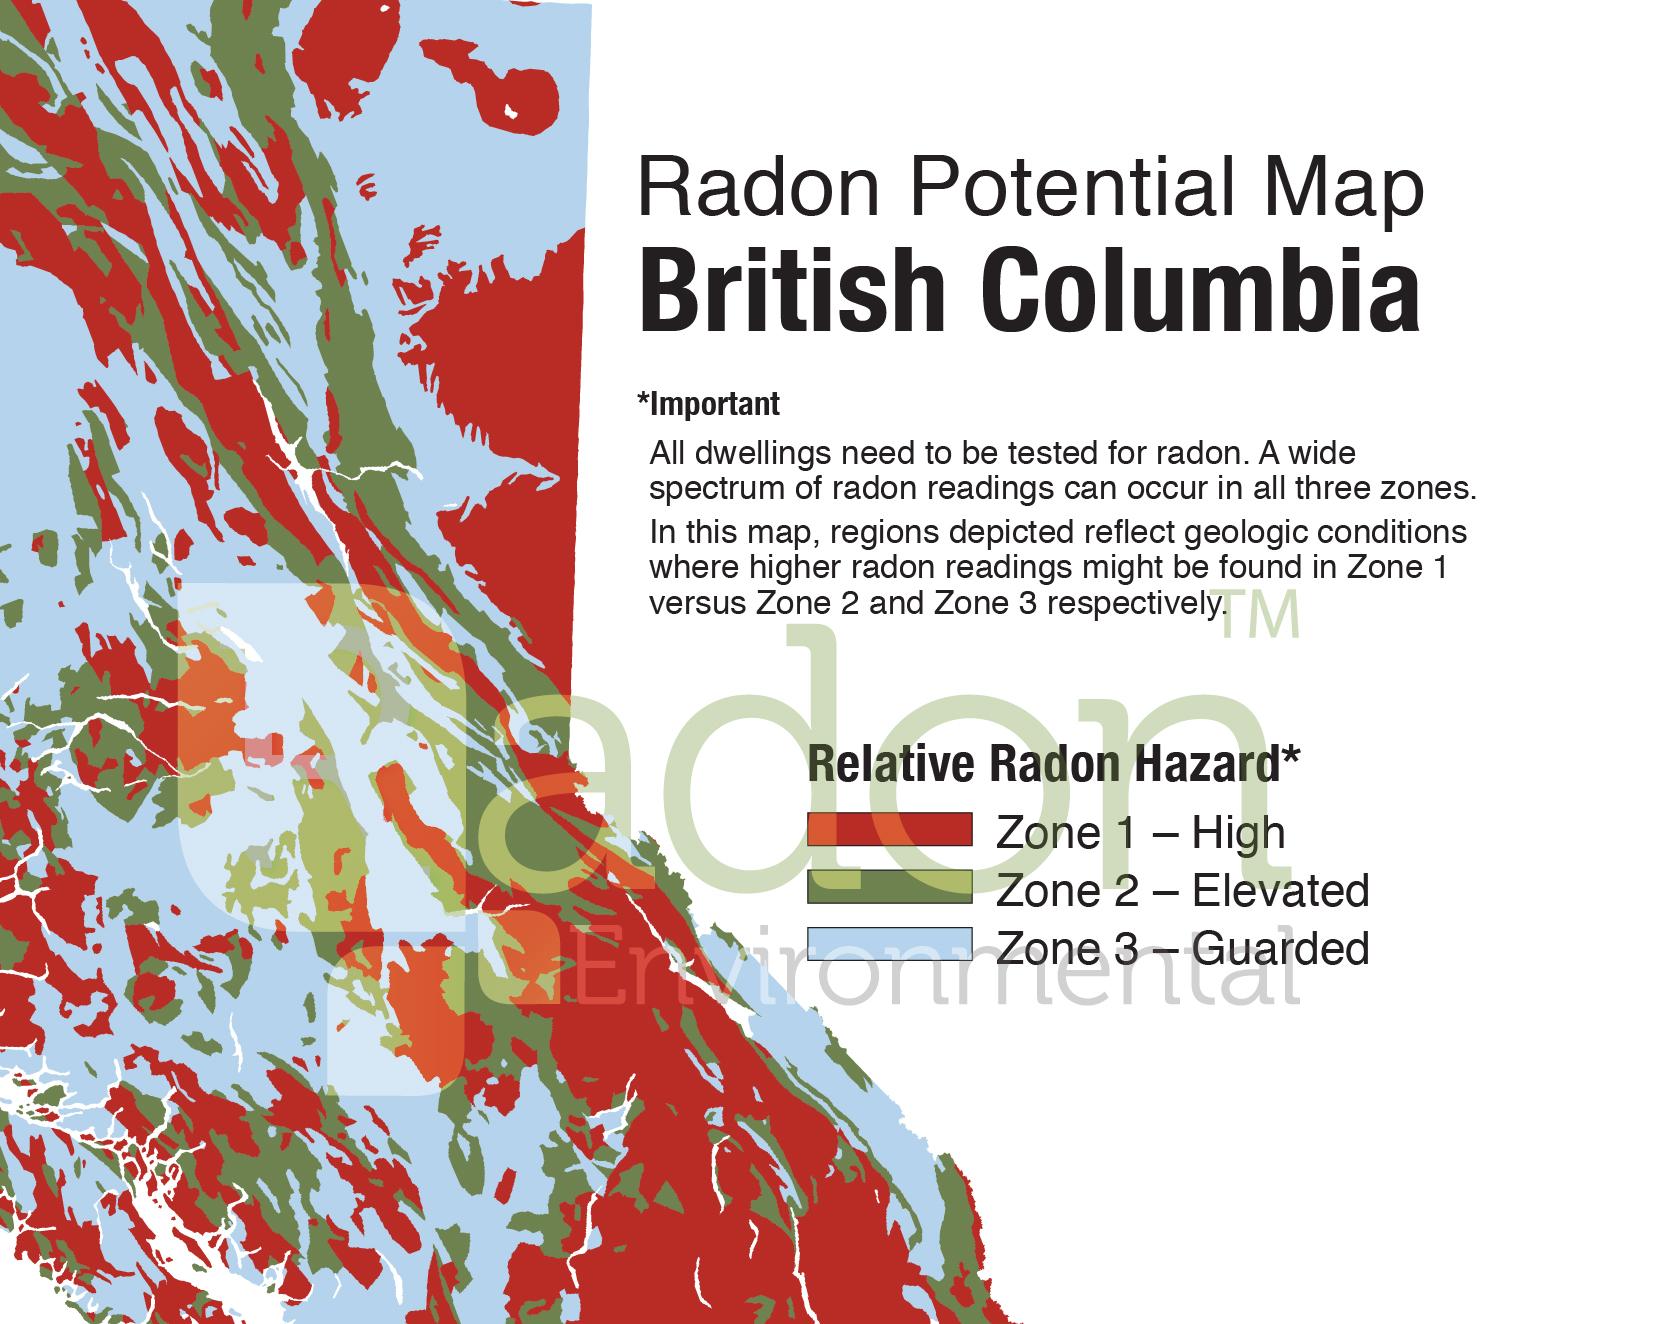 Radon Potential Map of BC.